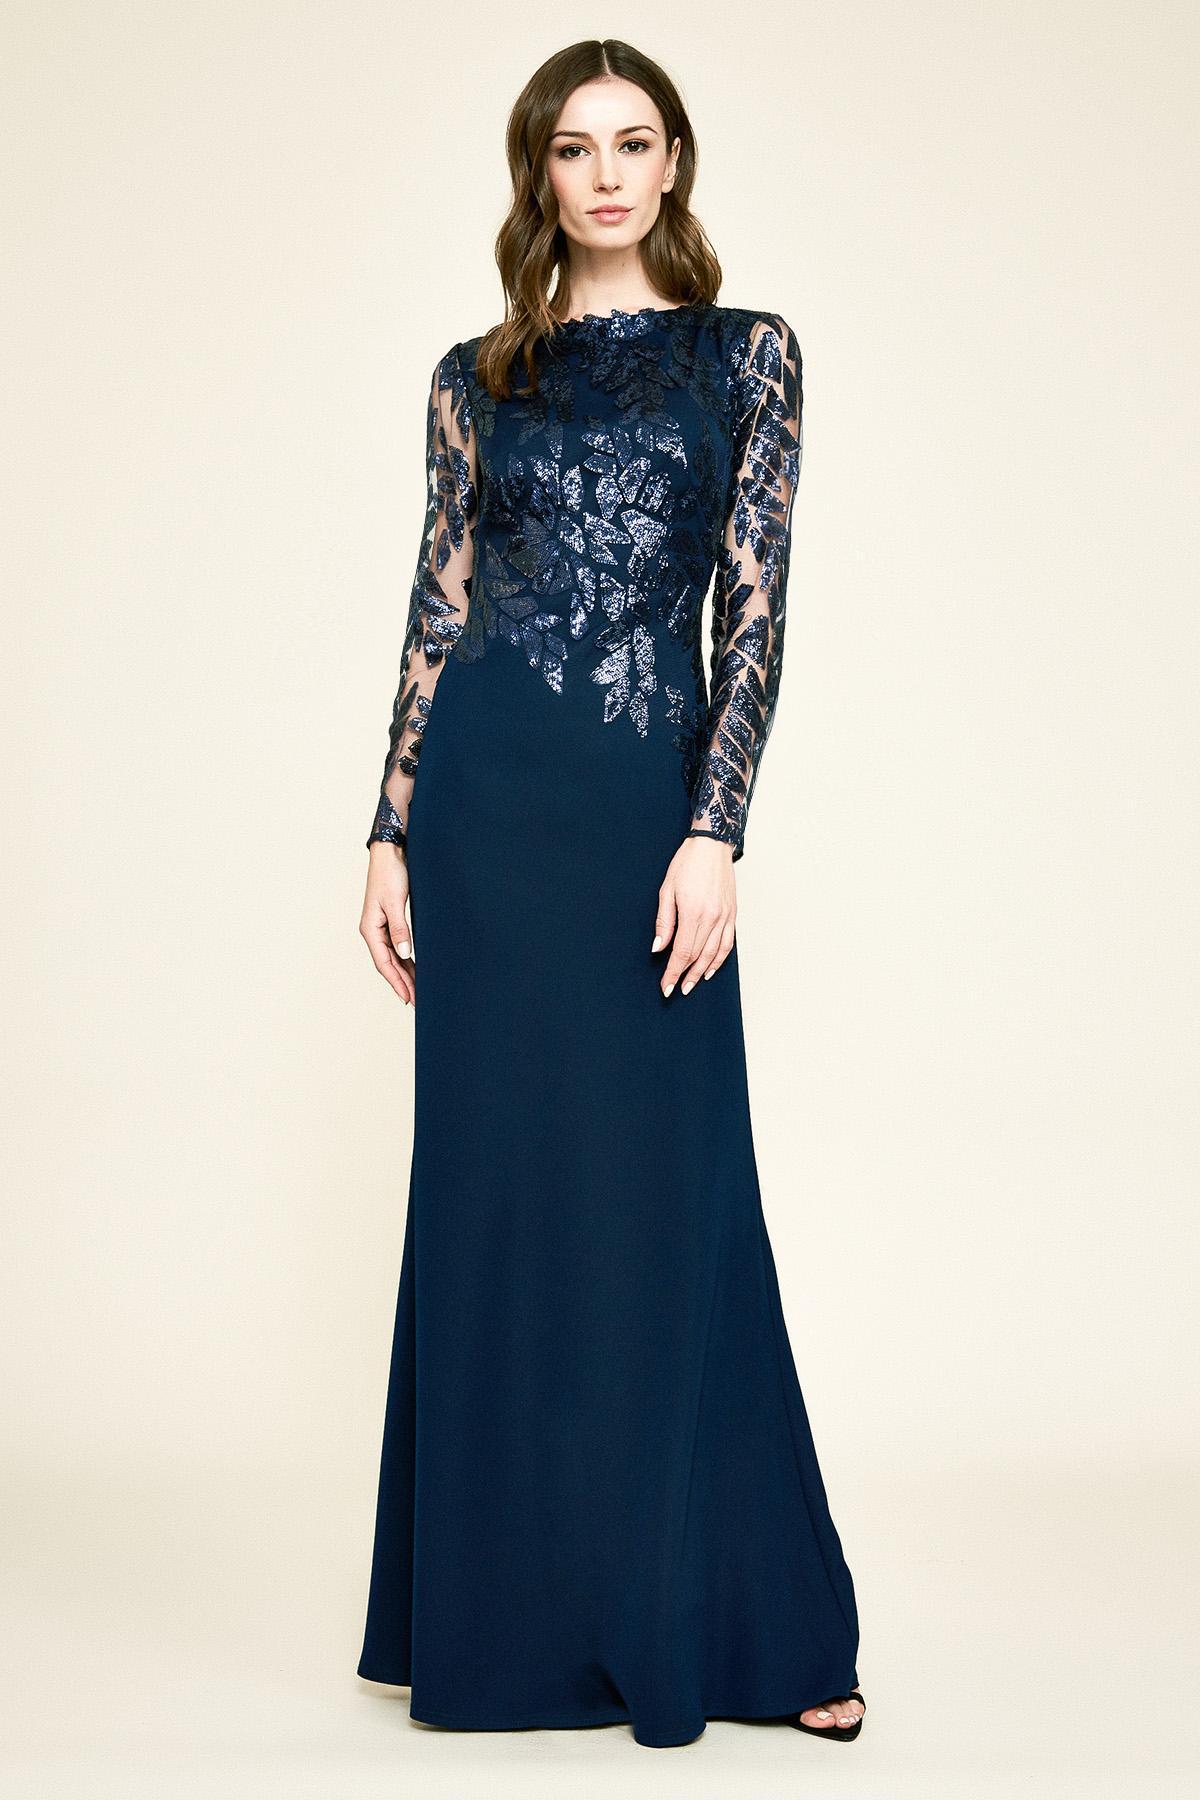 2d548e162278c Tadashi Shoji Gaia Long-sleeve Crepe & Sequin Gown in Blue - Lyst